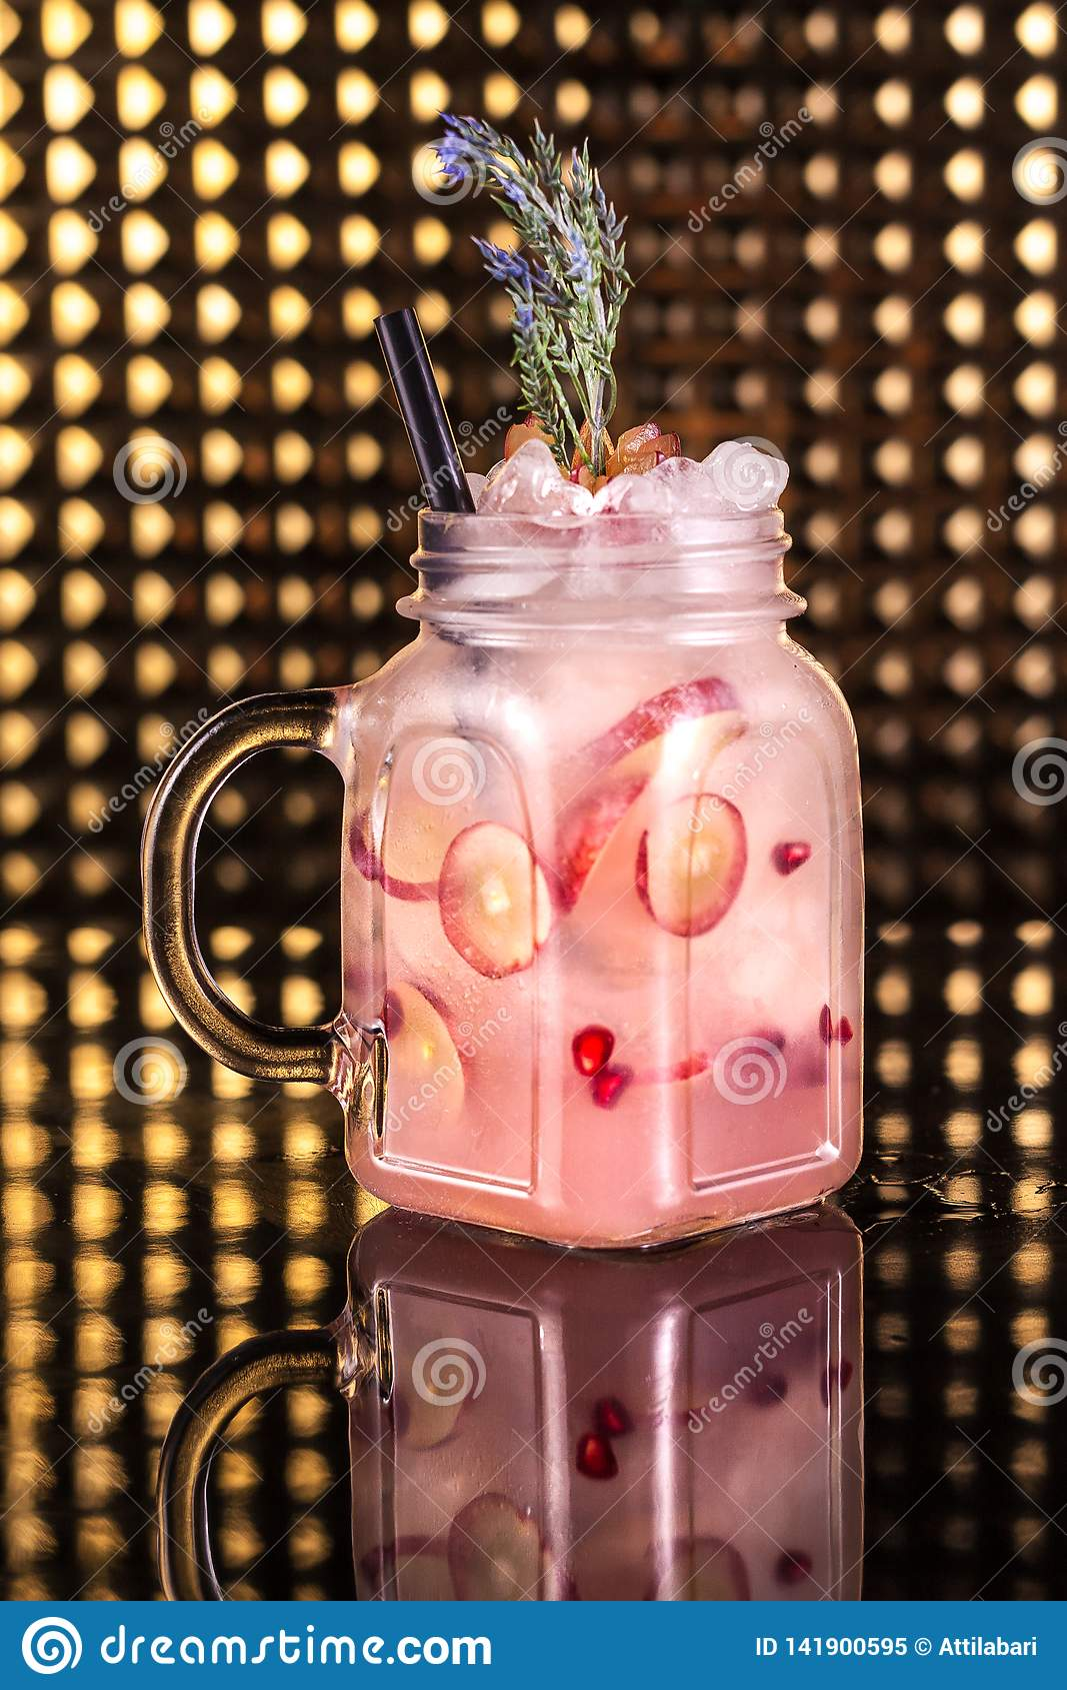 Pink cocktail lemonade with fresh passion fruit in vintage jar